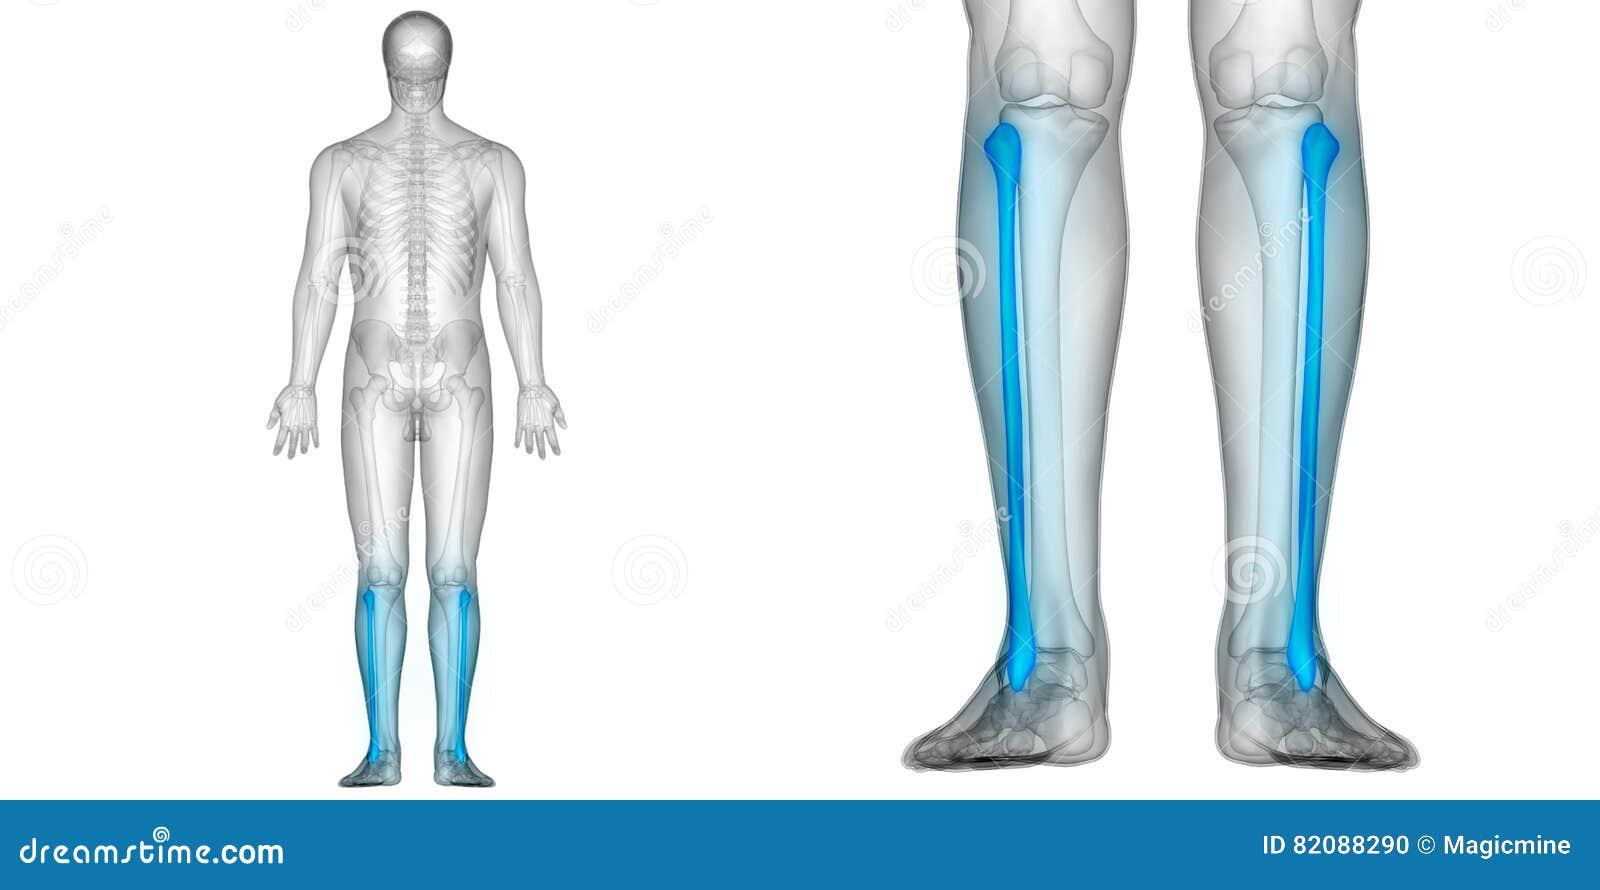 Human Body Bone Joint Pains Anatomy Fibula Bones Posterior View